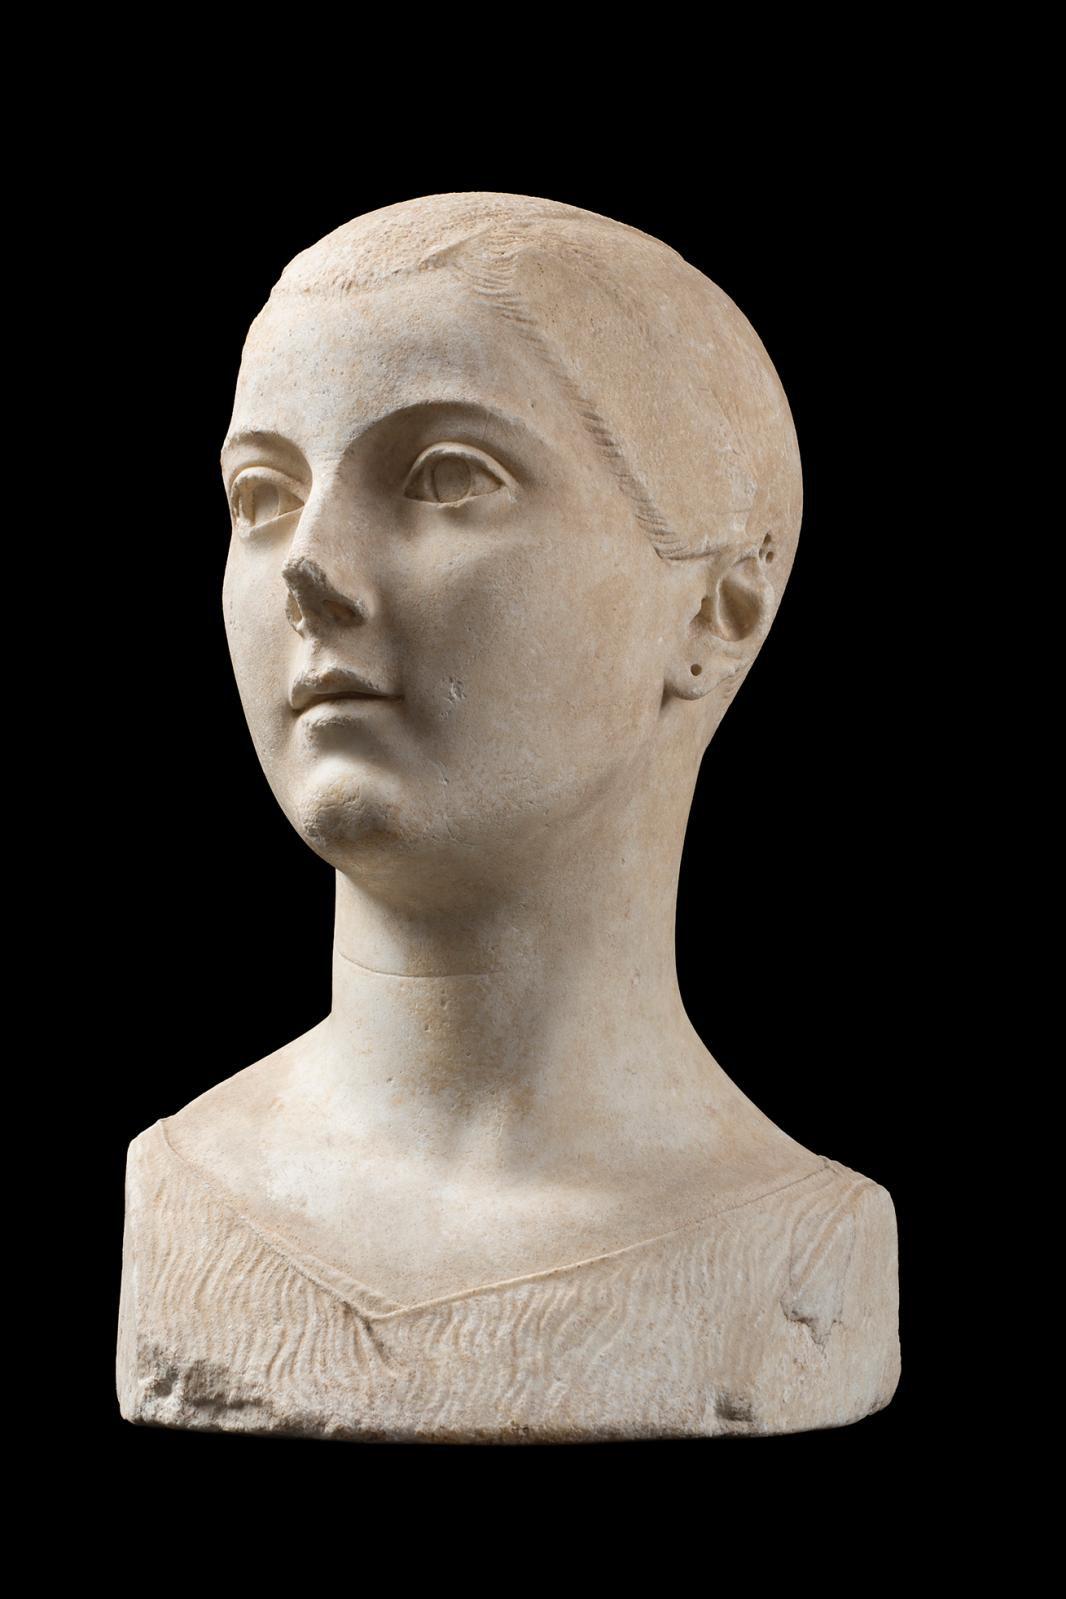 Girl from Vulci, marble, h. 70 cm/27.56 in. © Fondazione Torlonia - Photo Lorenzo De Masi